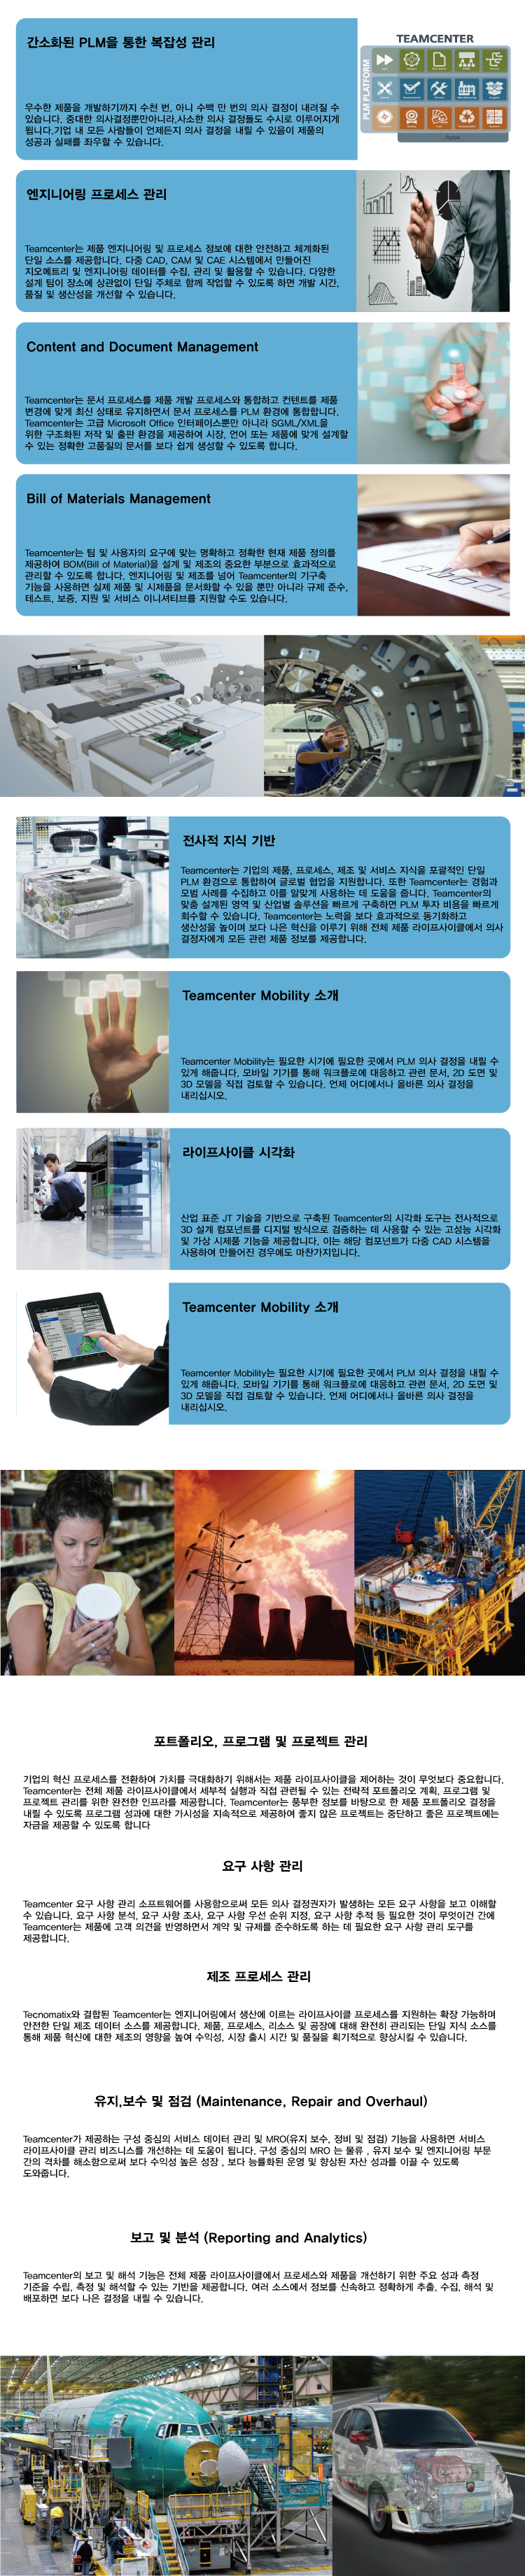 TEAMCENTER-PAGE4.jpg